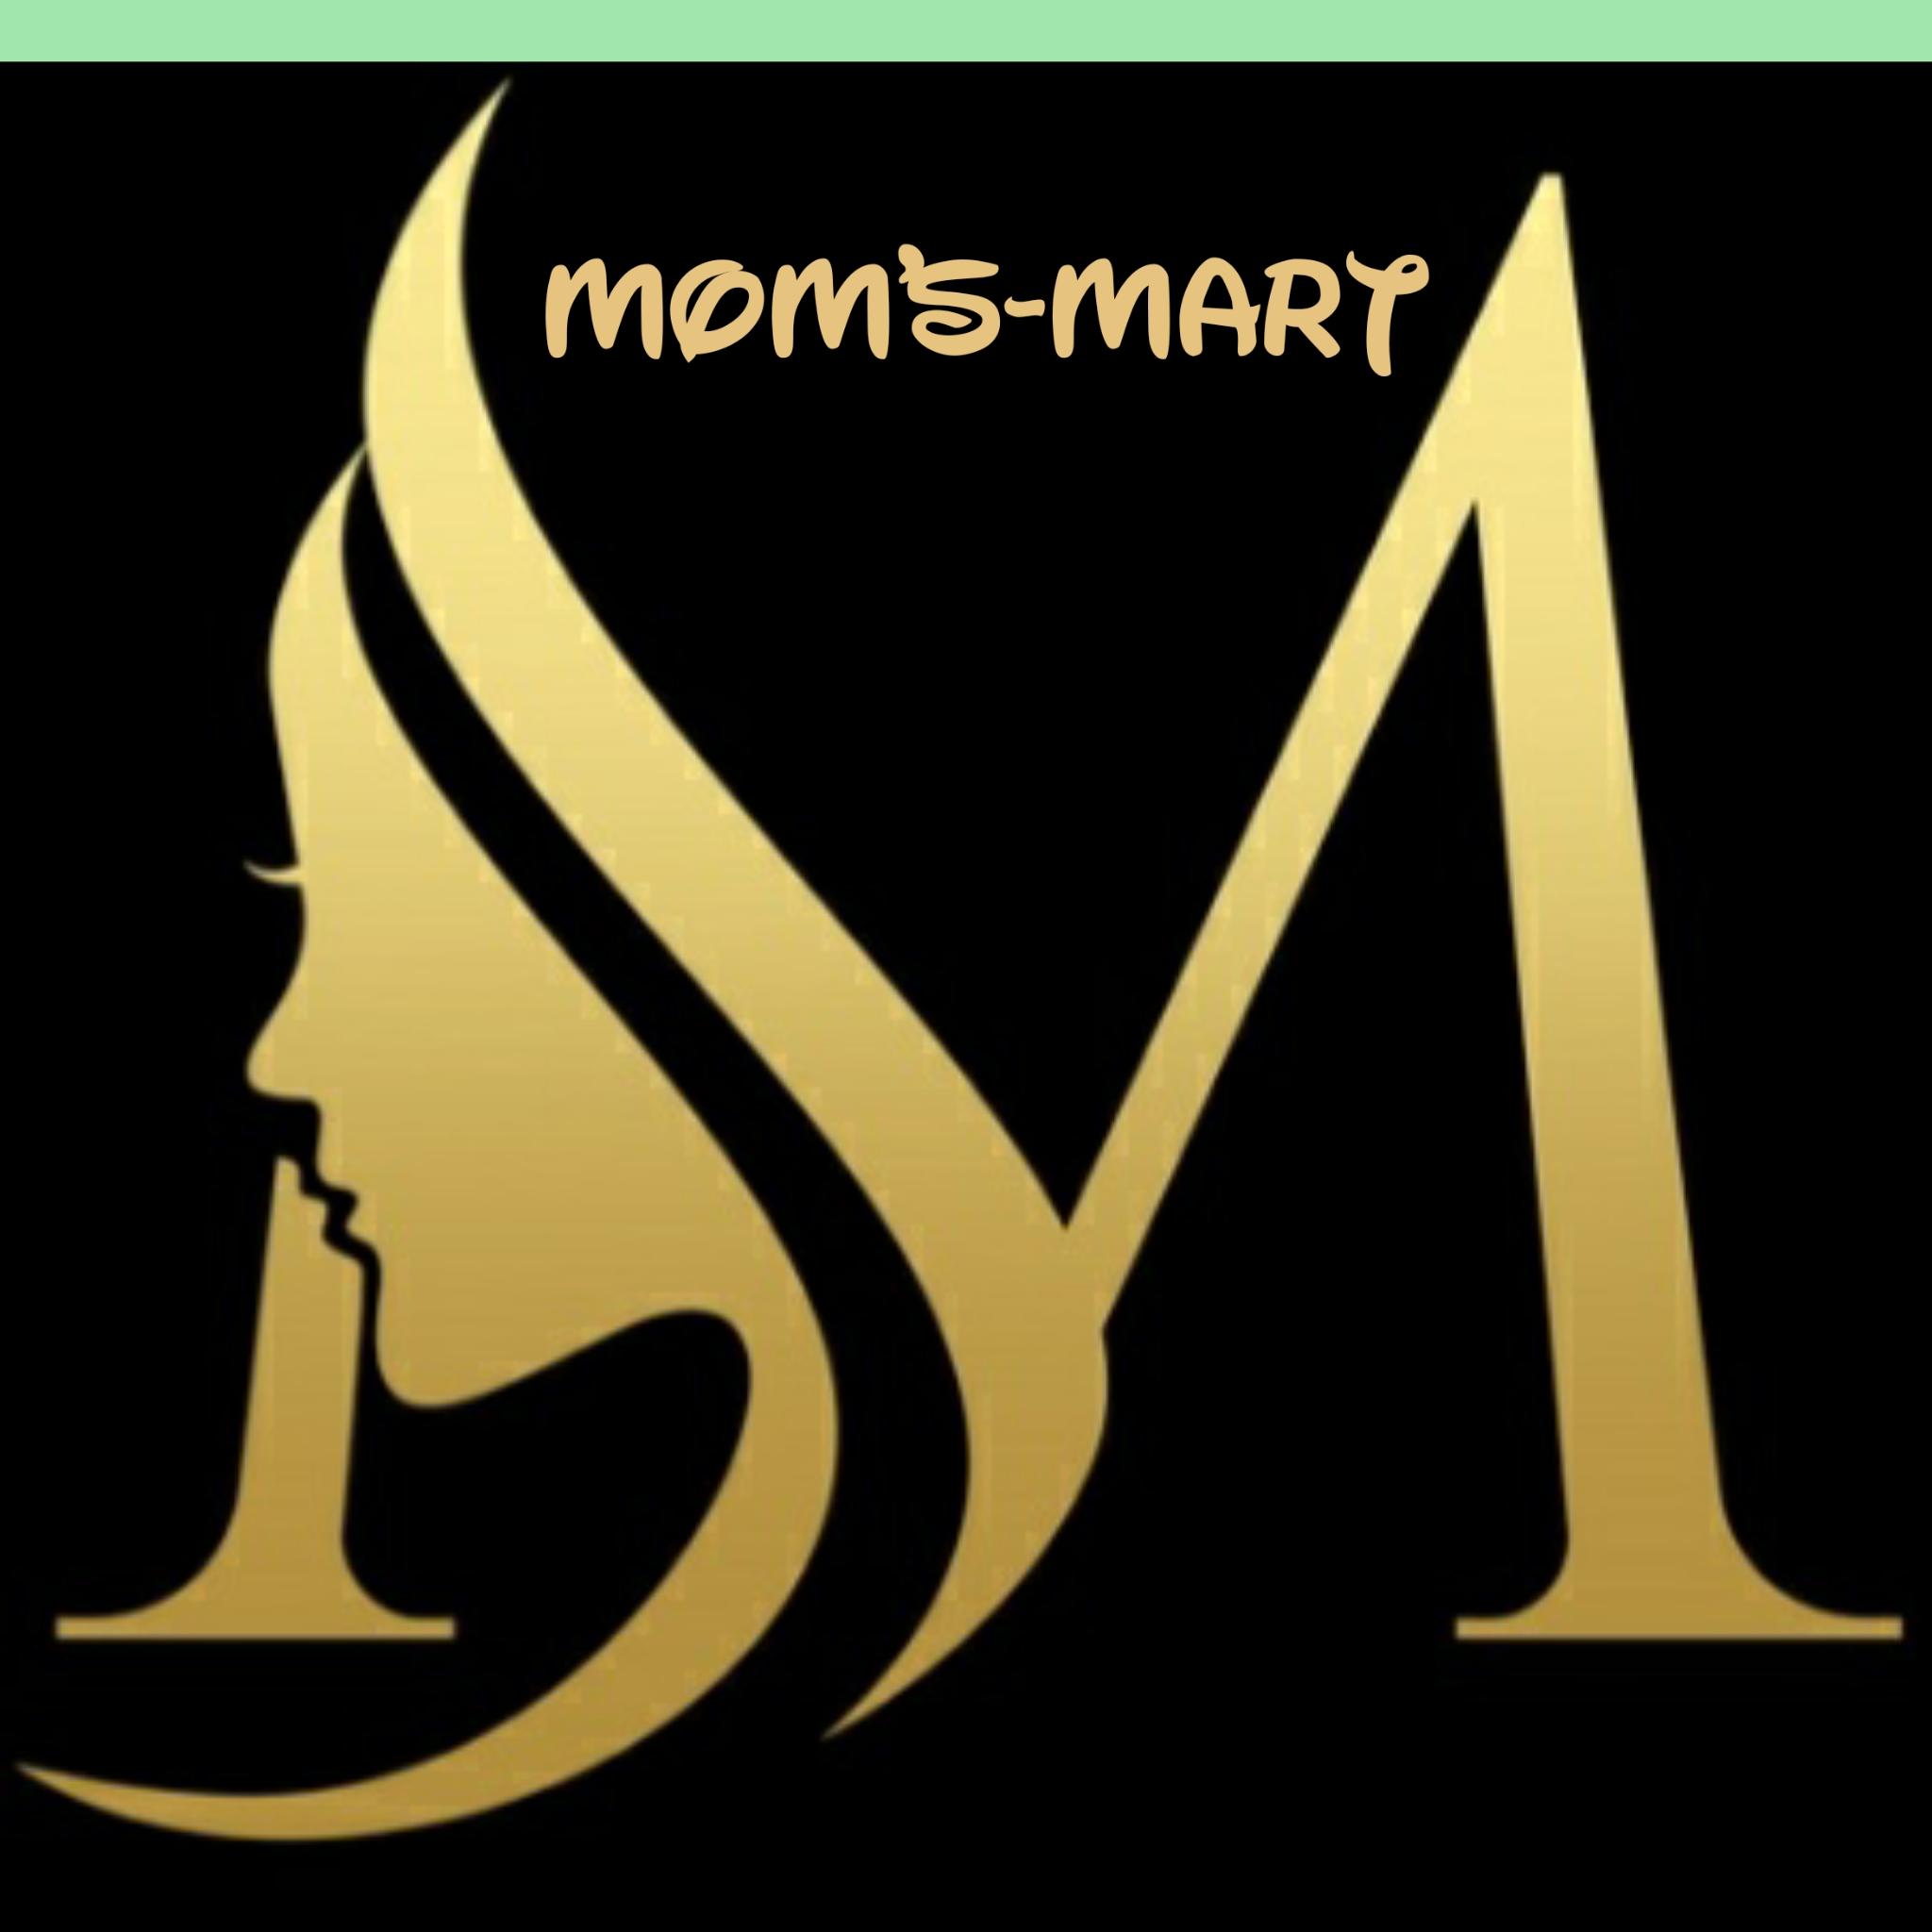 Mom's-mart